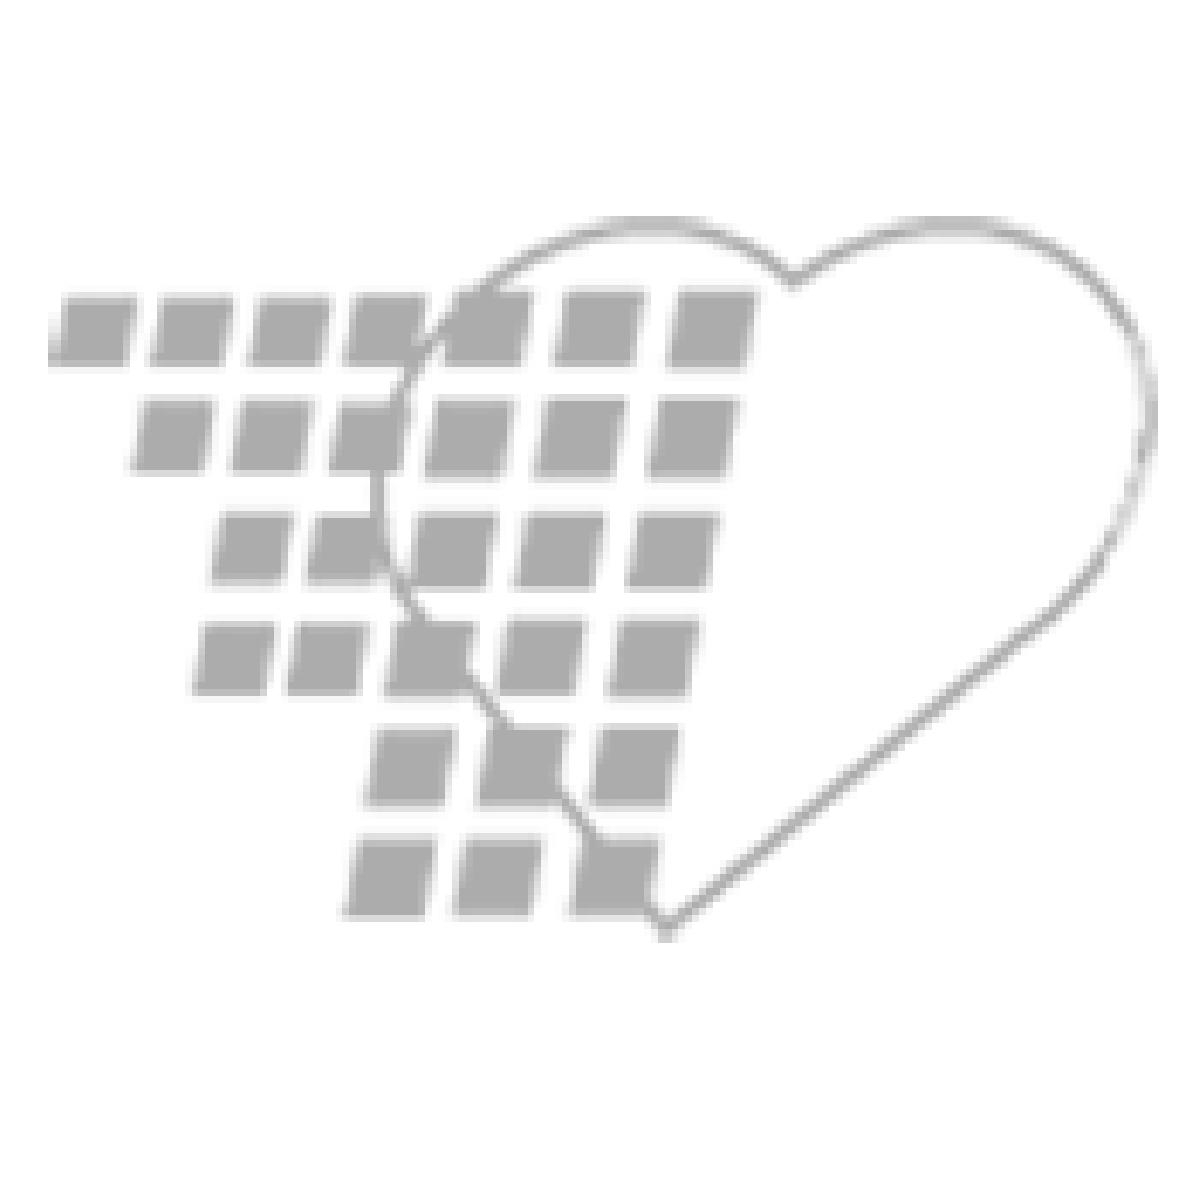 06-93-3105 Demo Dose® Fentynl 50 mcg/hr Transdermal Patch System -10/Pack